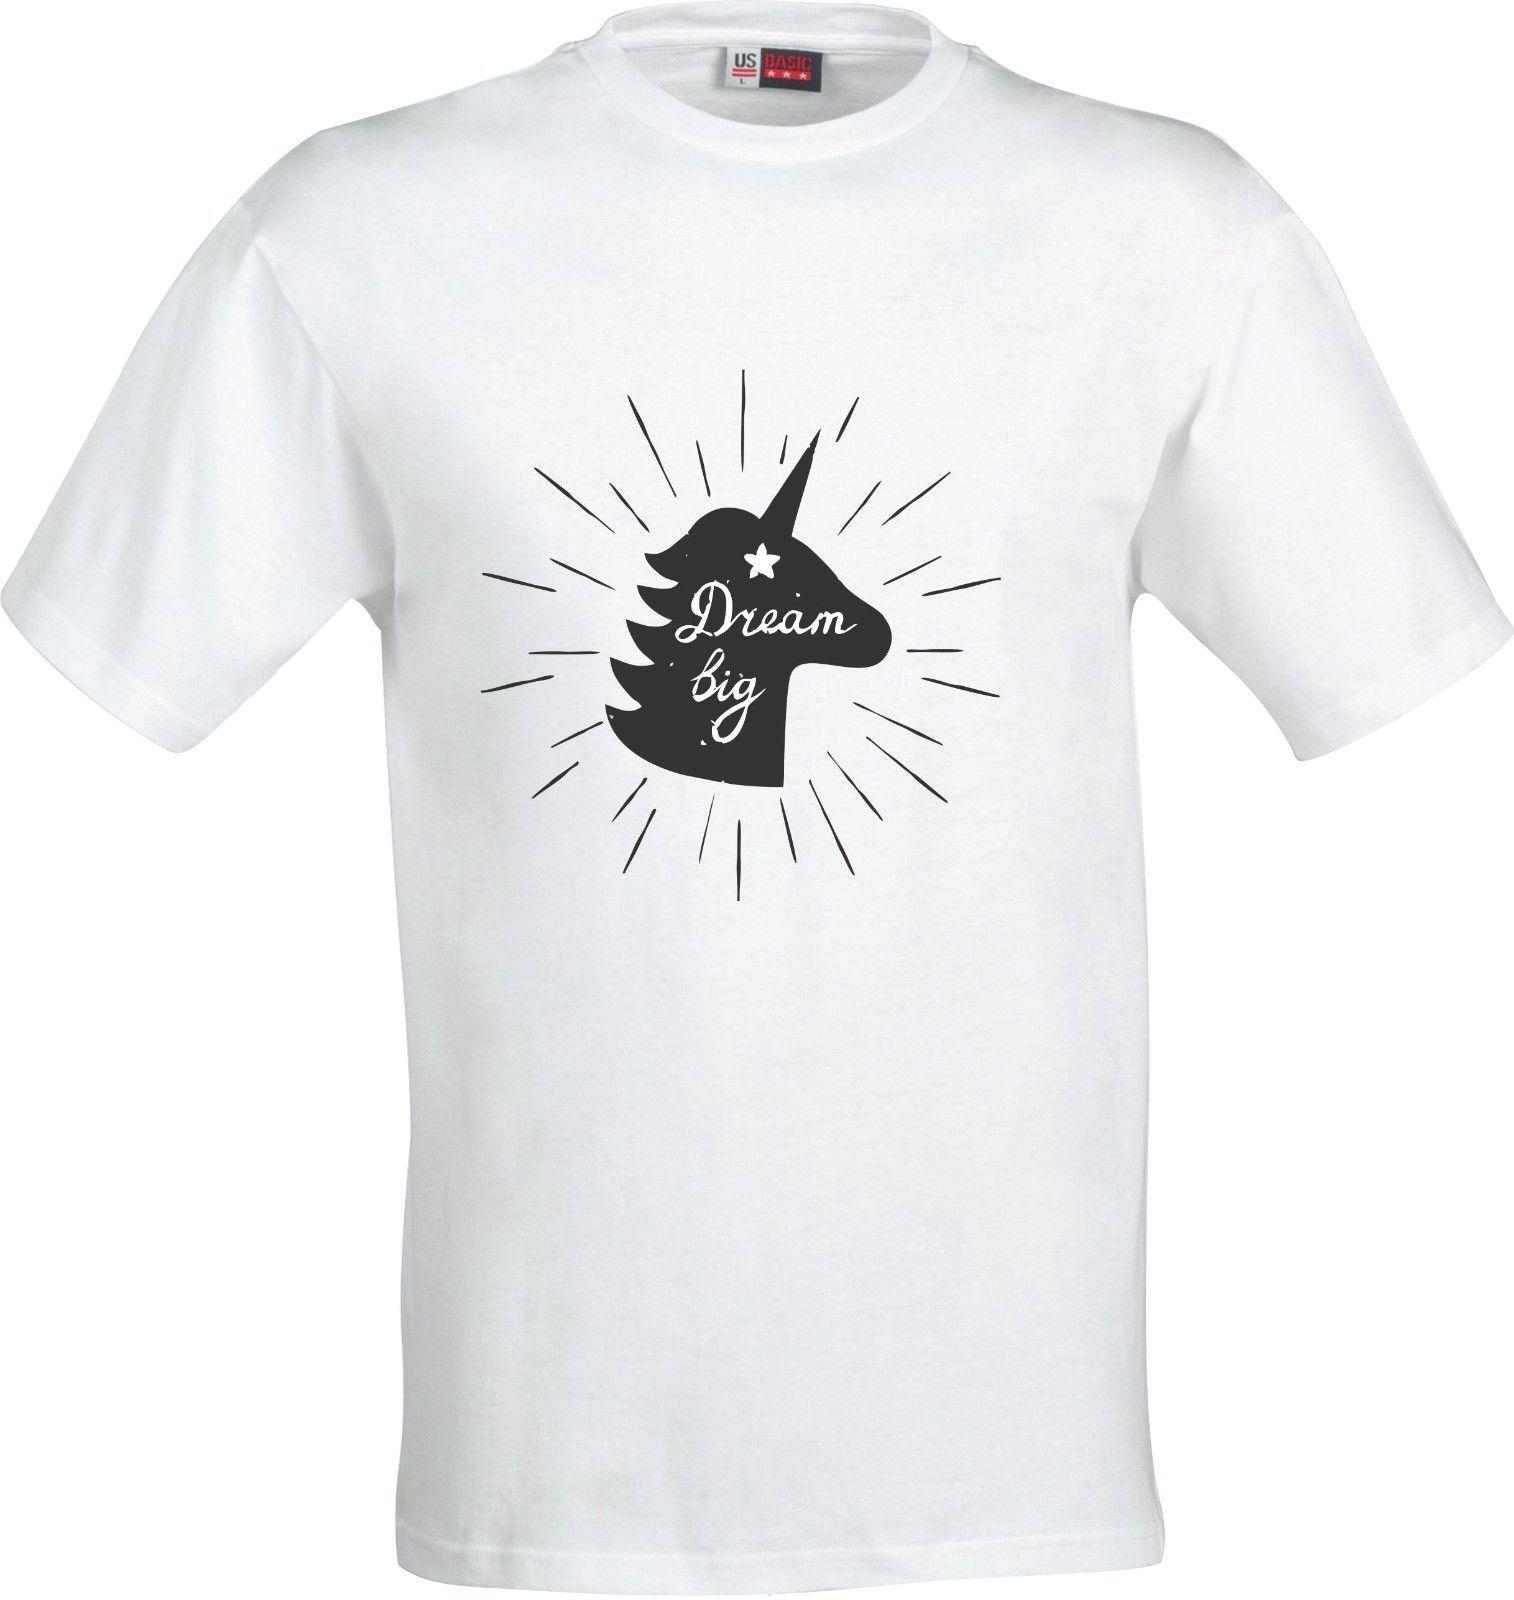 a6d440ace UNICORN DREAM BIG GIFT CHRISTMAS BIRTHDAY FULL COLOR SUBLIMATION T SHIRT  Business Shirt Retro Tees From Xm24tshirt, $12.05  DHgate.Com